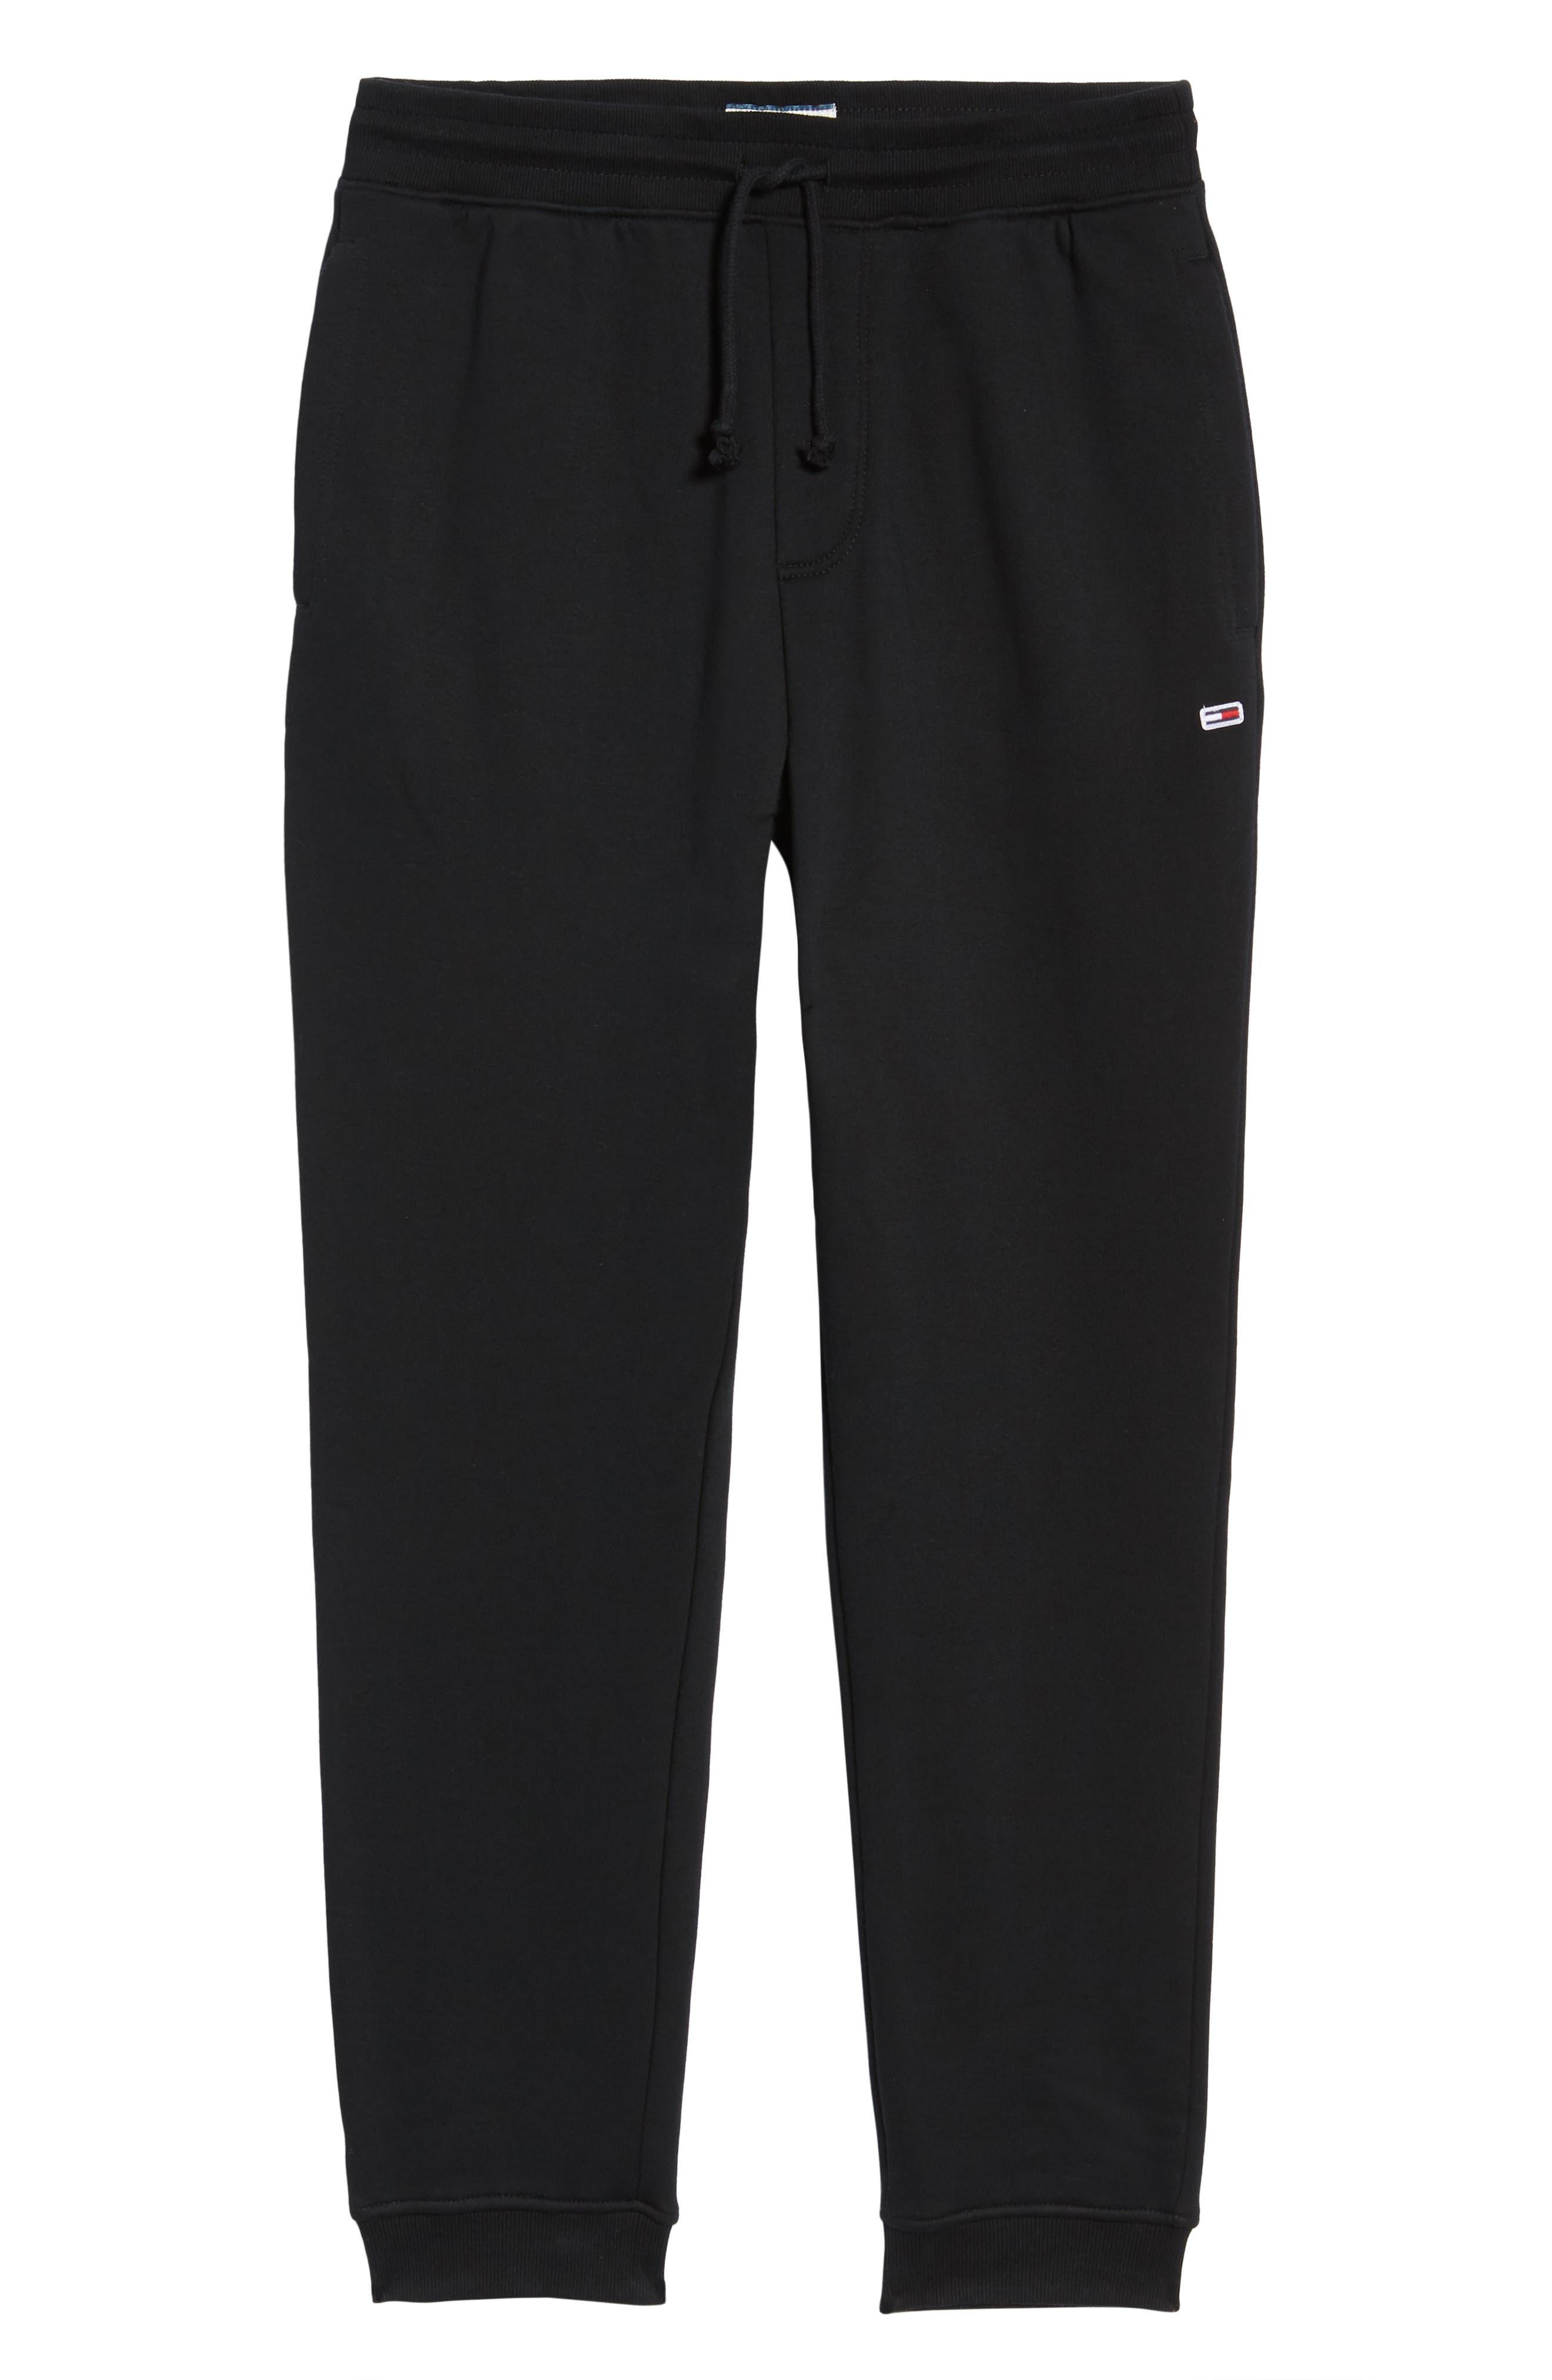 TJM Classics Sweatpants,                             Alternate thumbnail 6, color,                             TOMMY BLACK